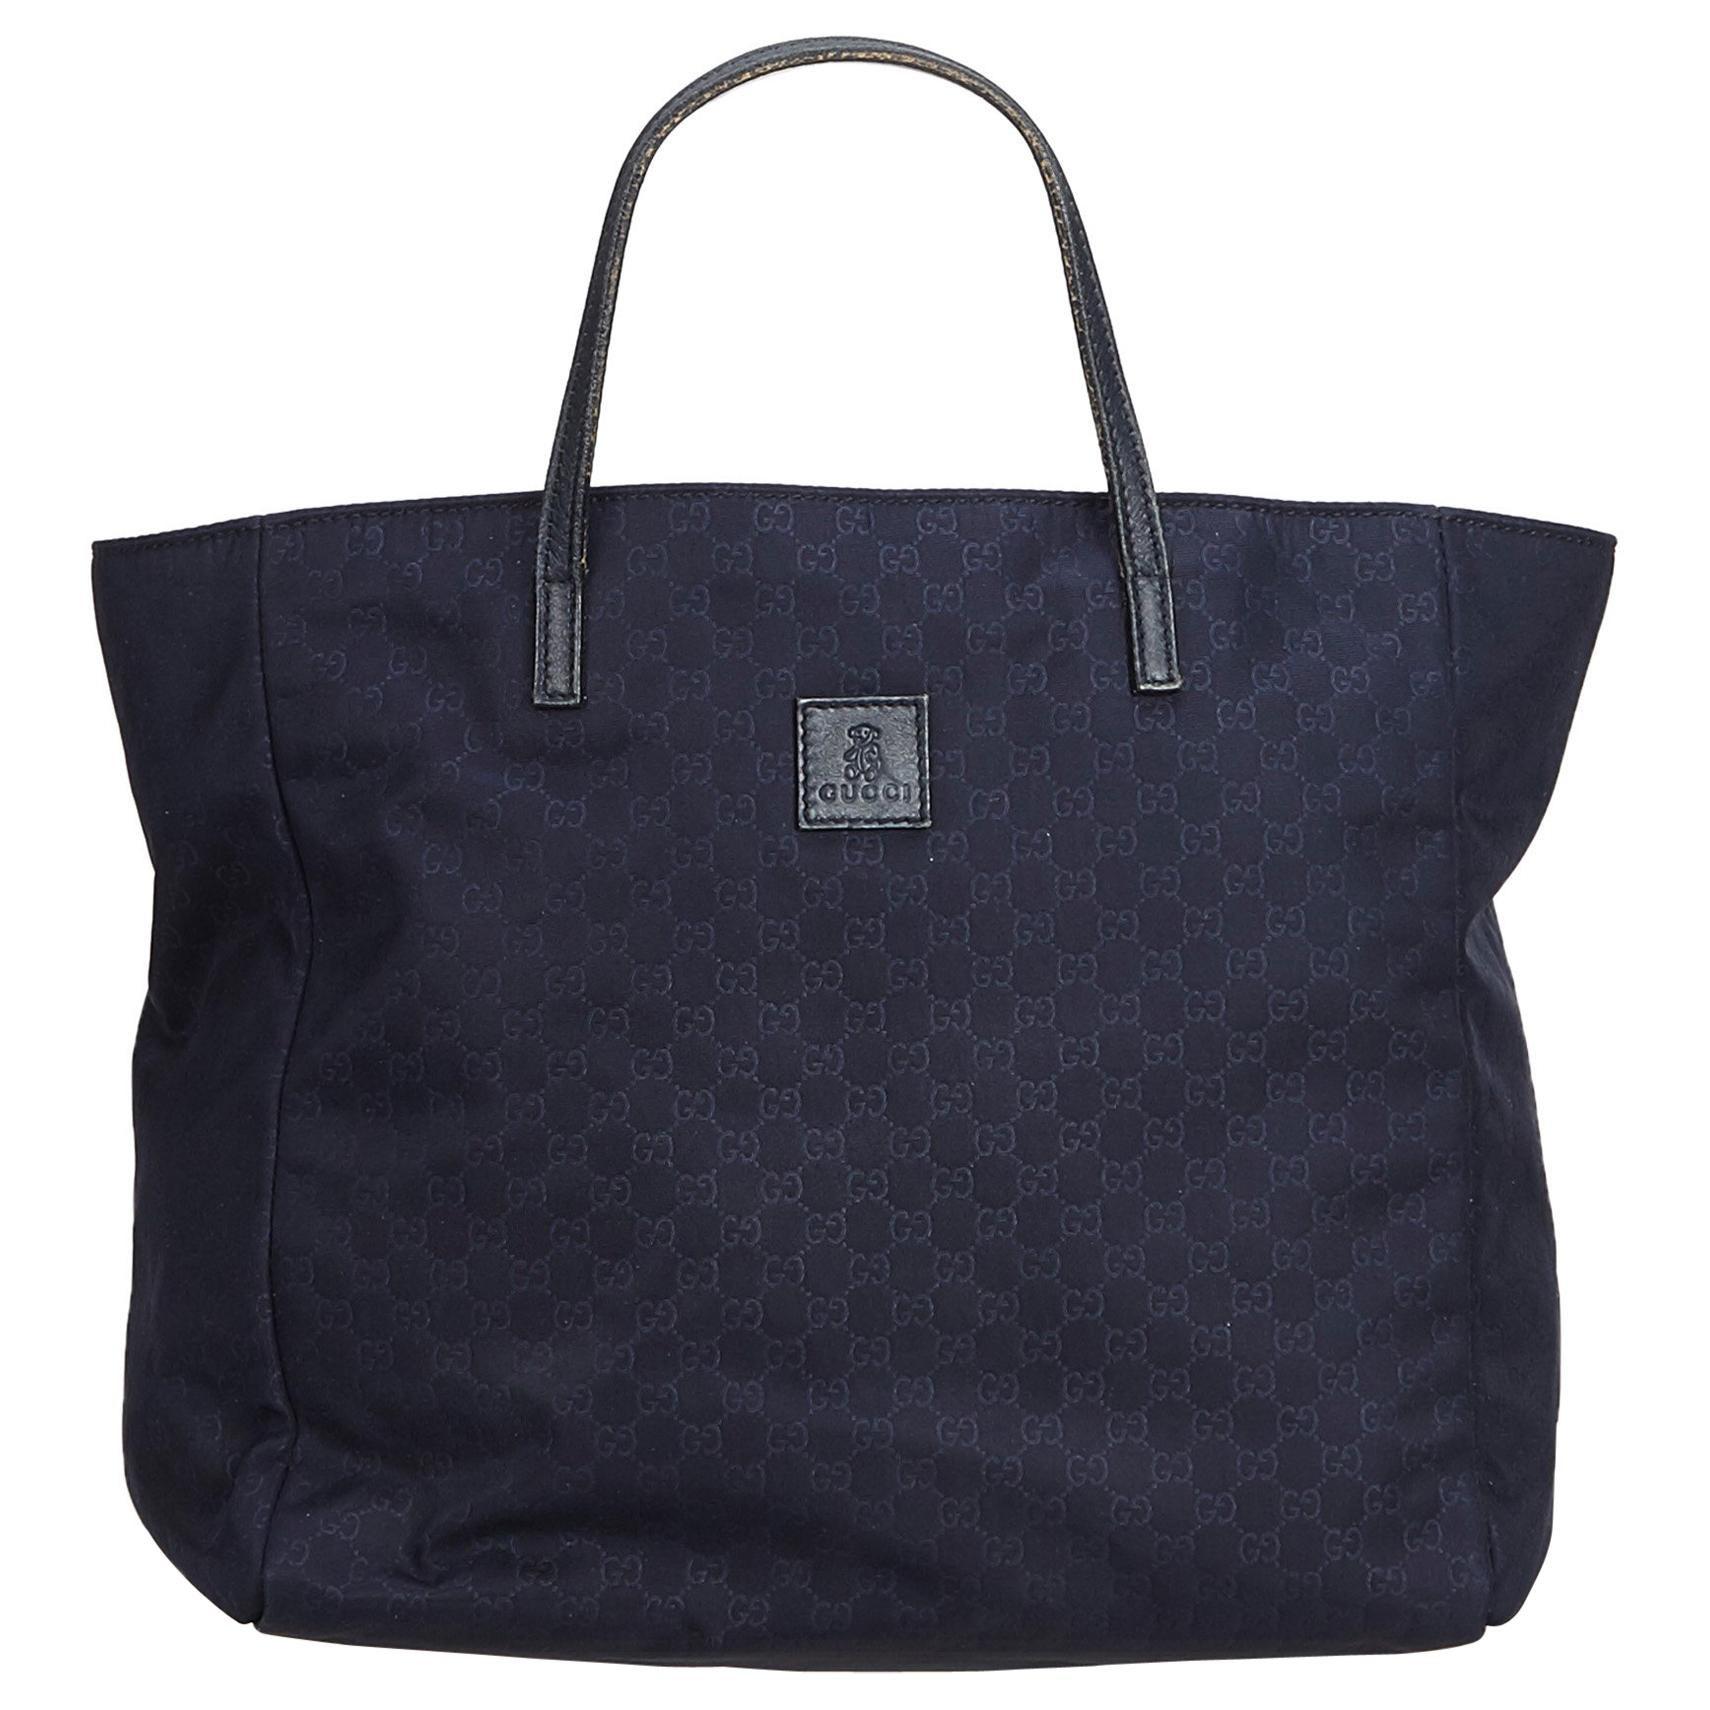 Gucci Blue Navy Nylon Fabric Gg Tote Bag Italy